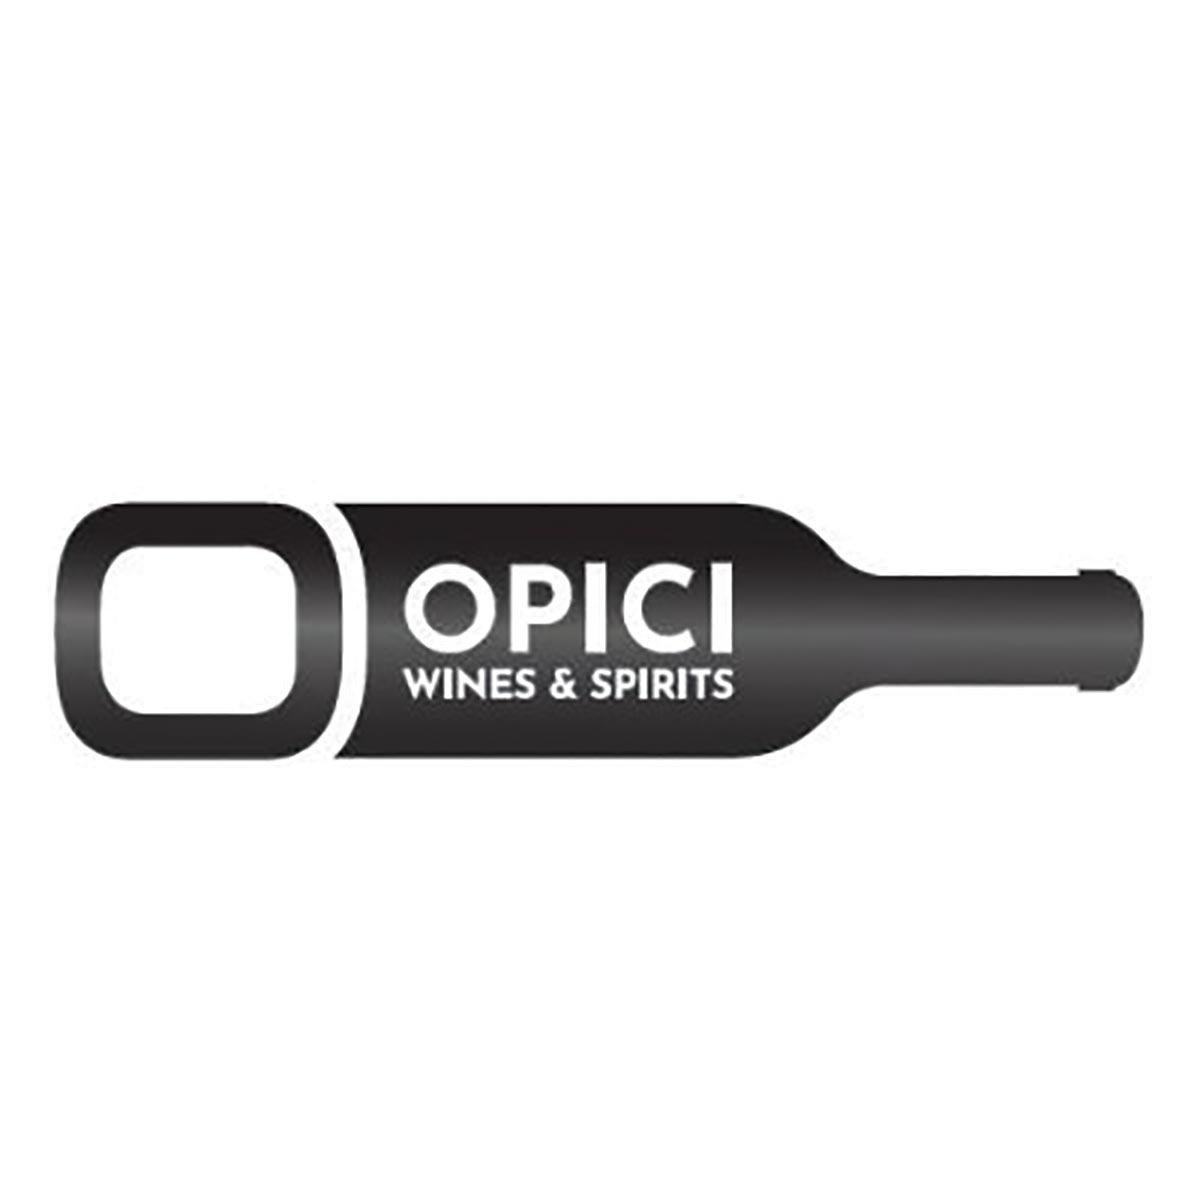 Opici Wines & Spirits Appoints Rhode Island Distributor Partner